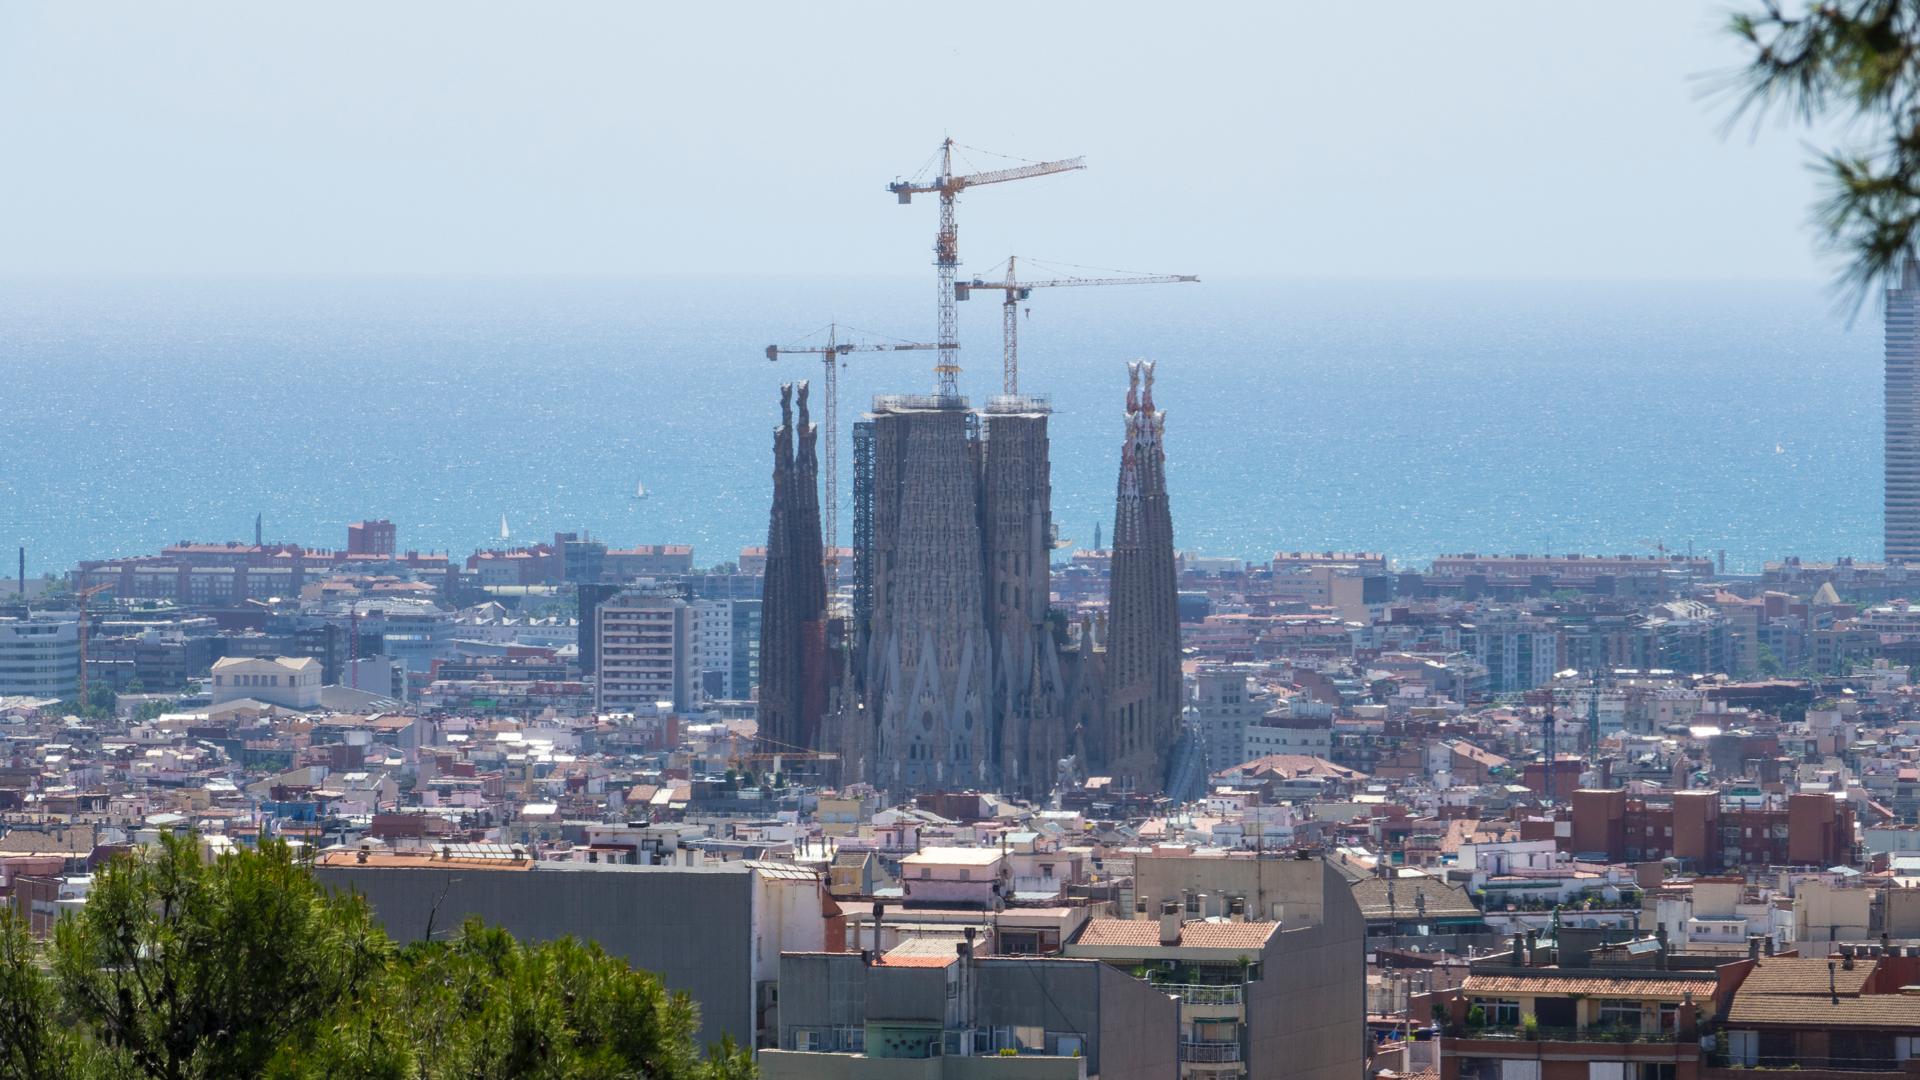 While walking through the Park, you had a view down to Gaudi's primary masterpiece, Sagrada Familia.